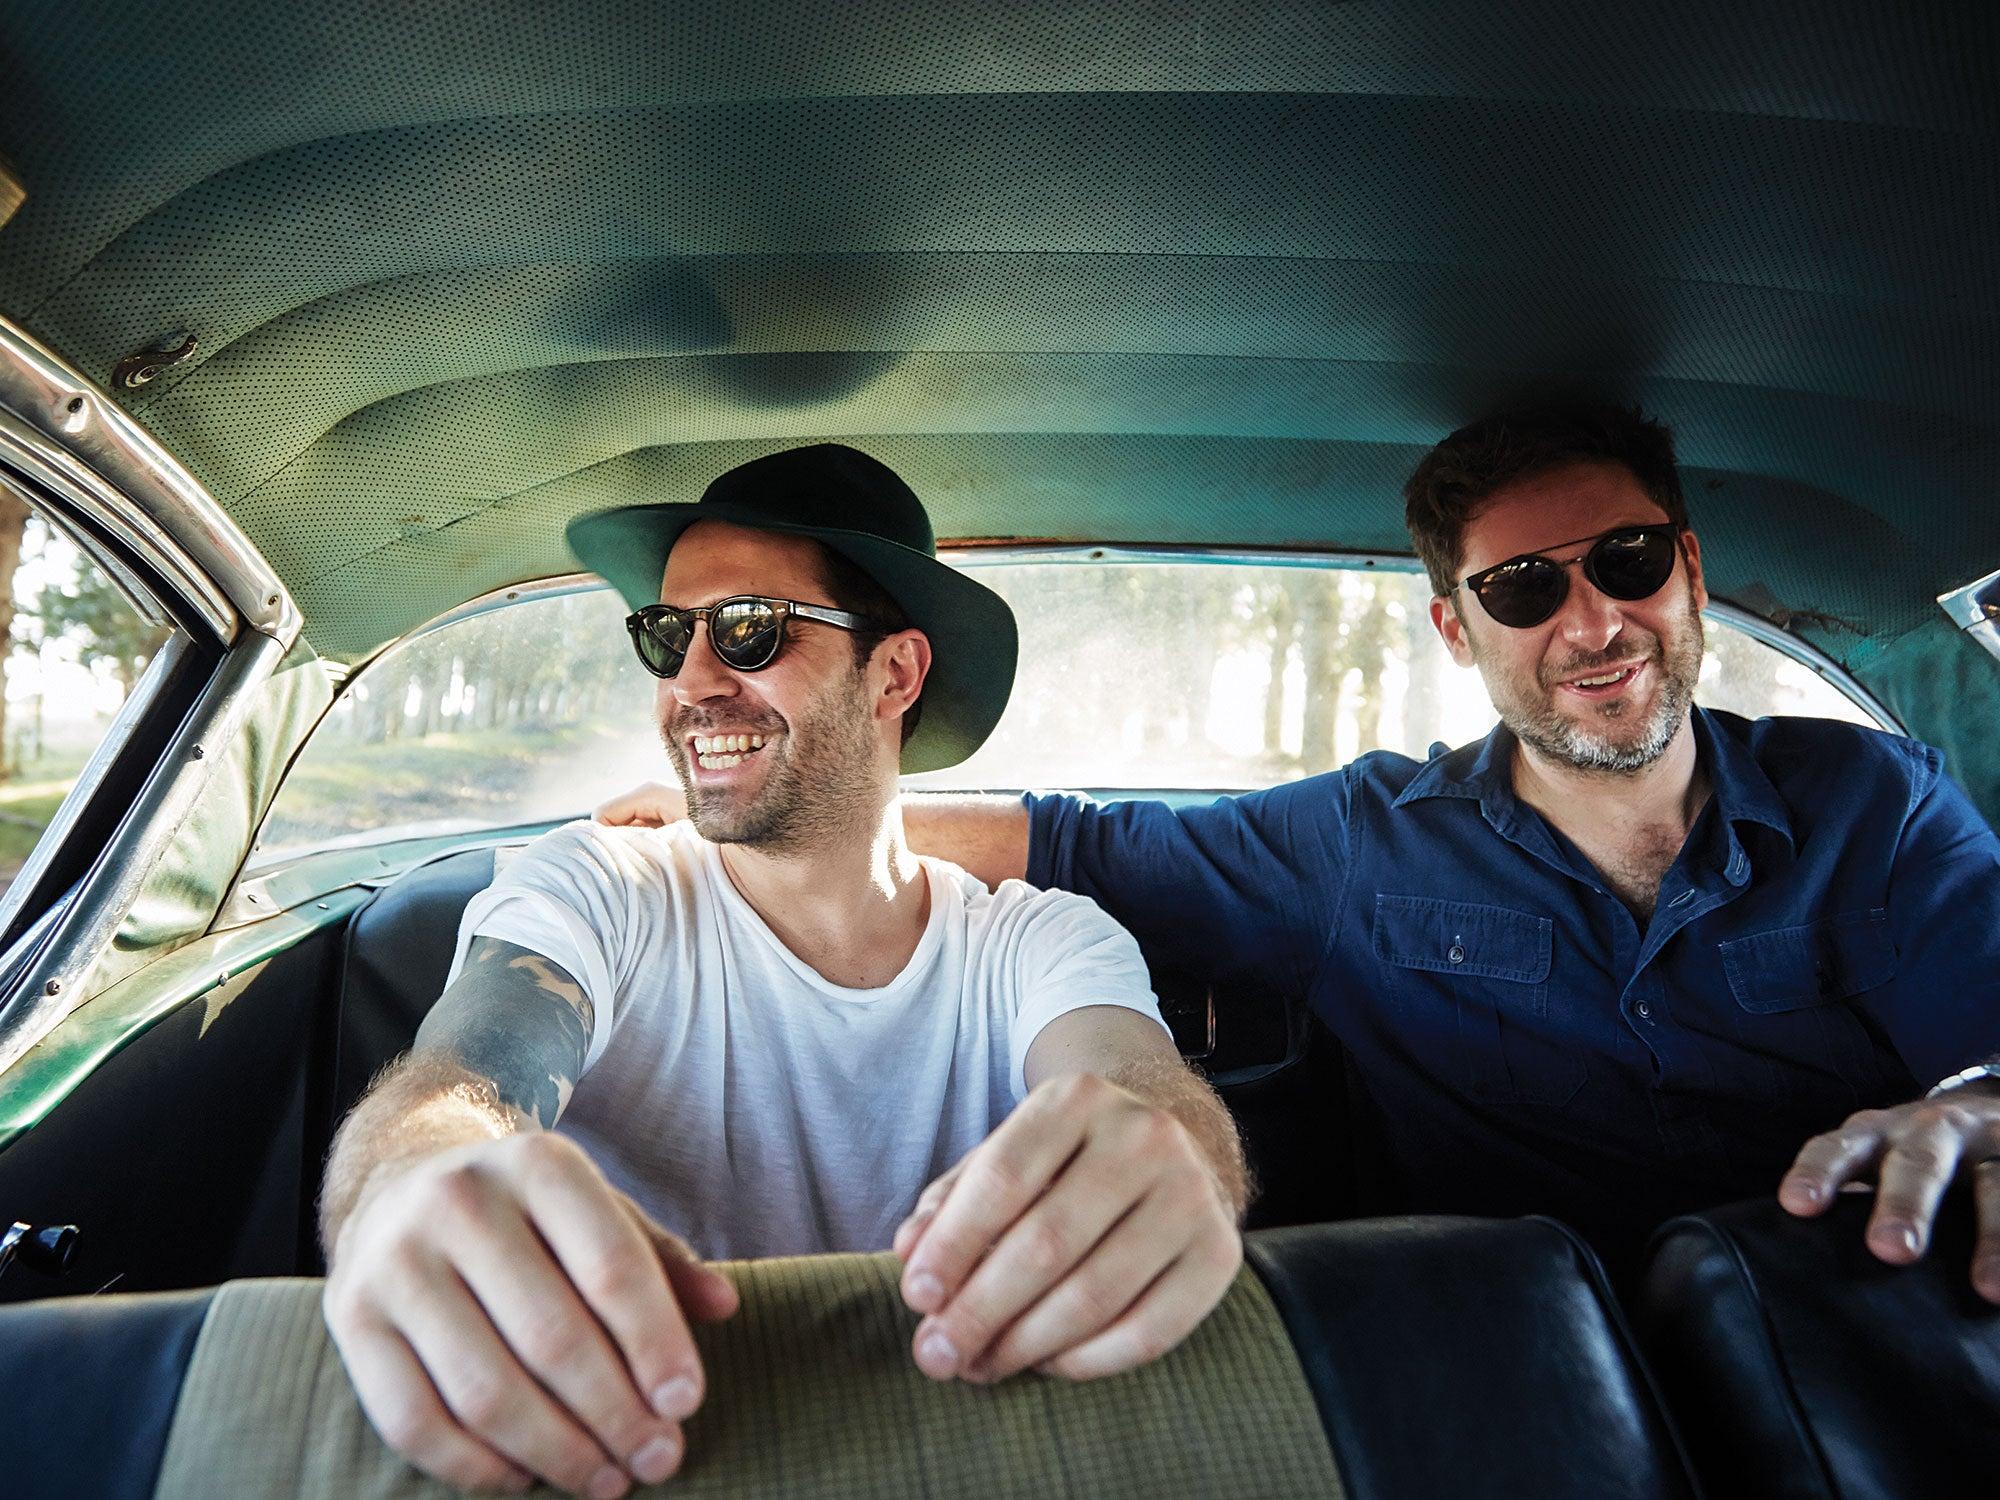 Uruguay 58 Chevy Impala road trip